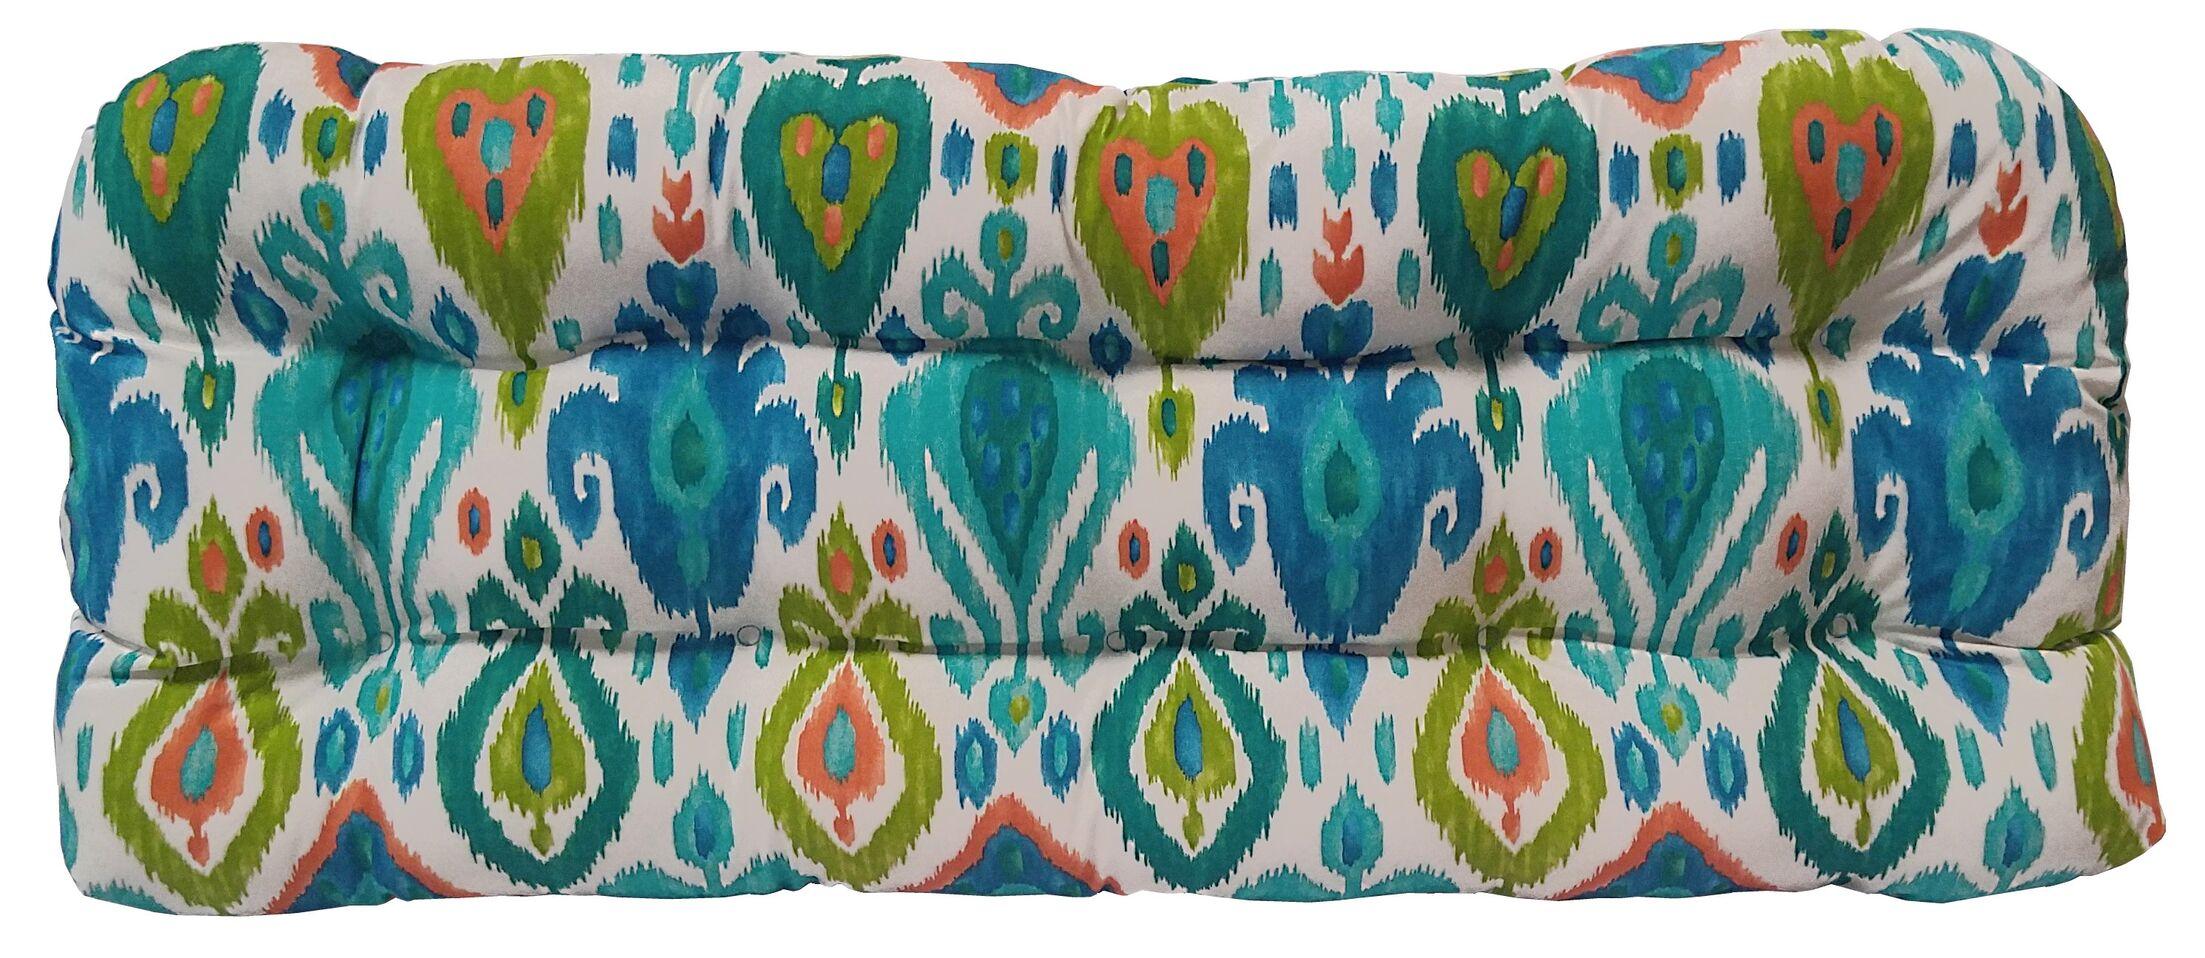 Croft Indoor/Outdoor Bench Cushion Color: Caribe